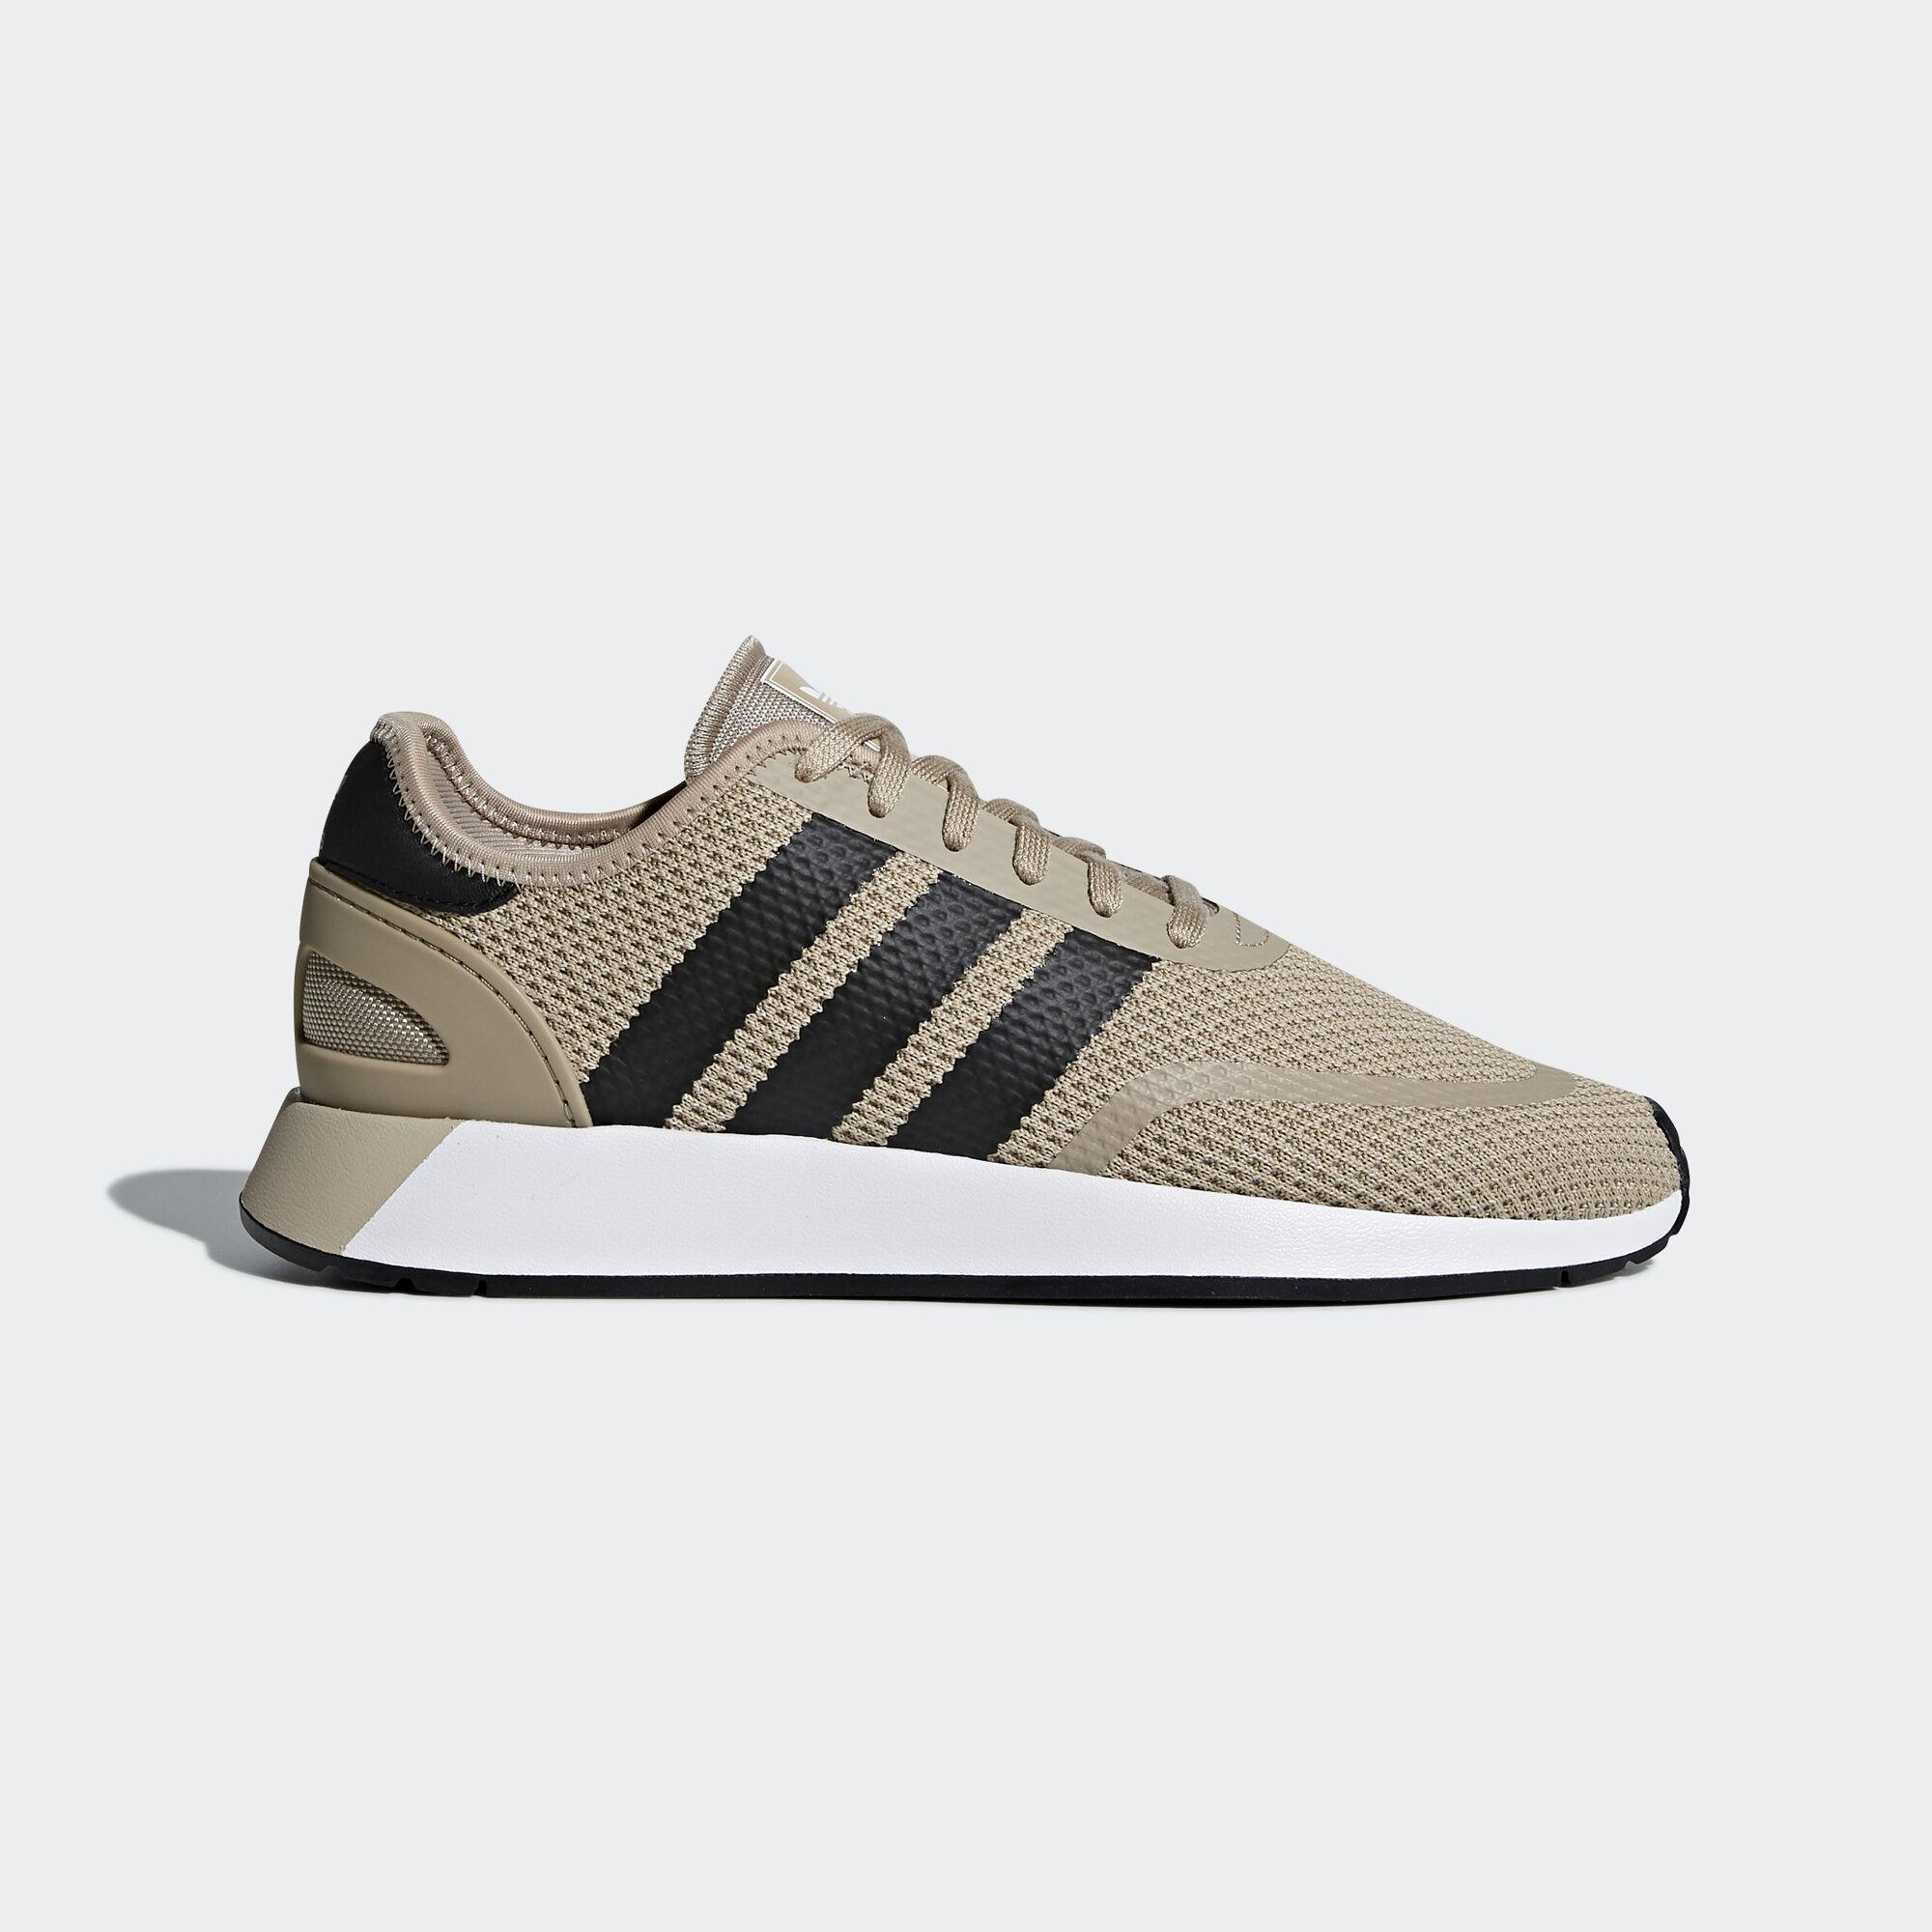 reputable site 15b0a fe01d adidas - N-5923 Shoes Beige  Core Black  Ftwr White B37955. Originals